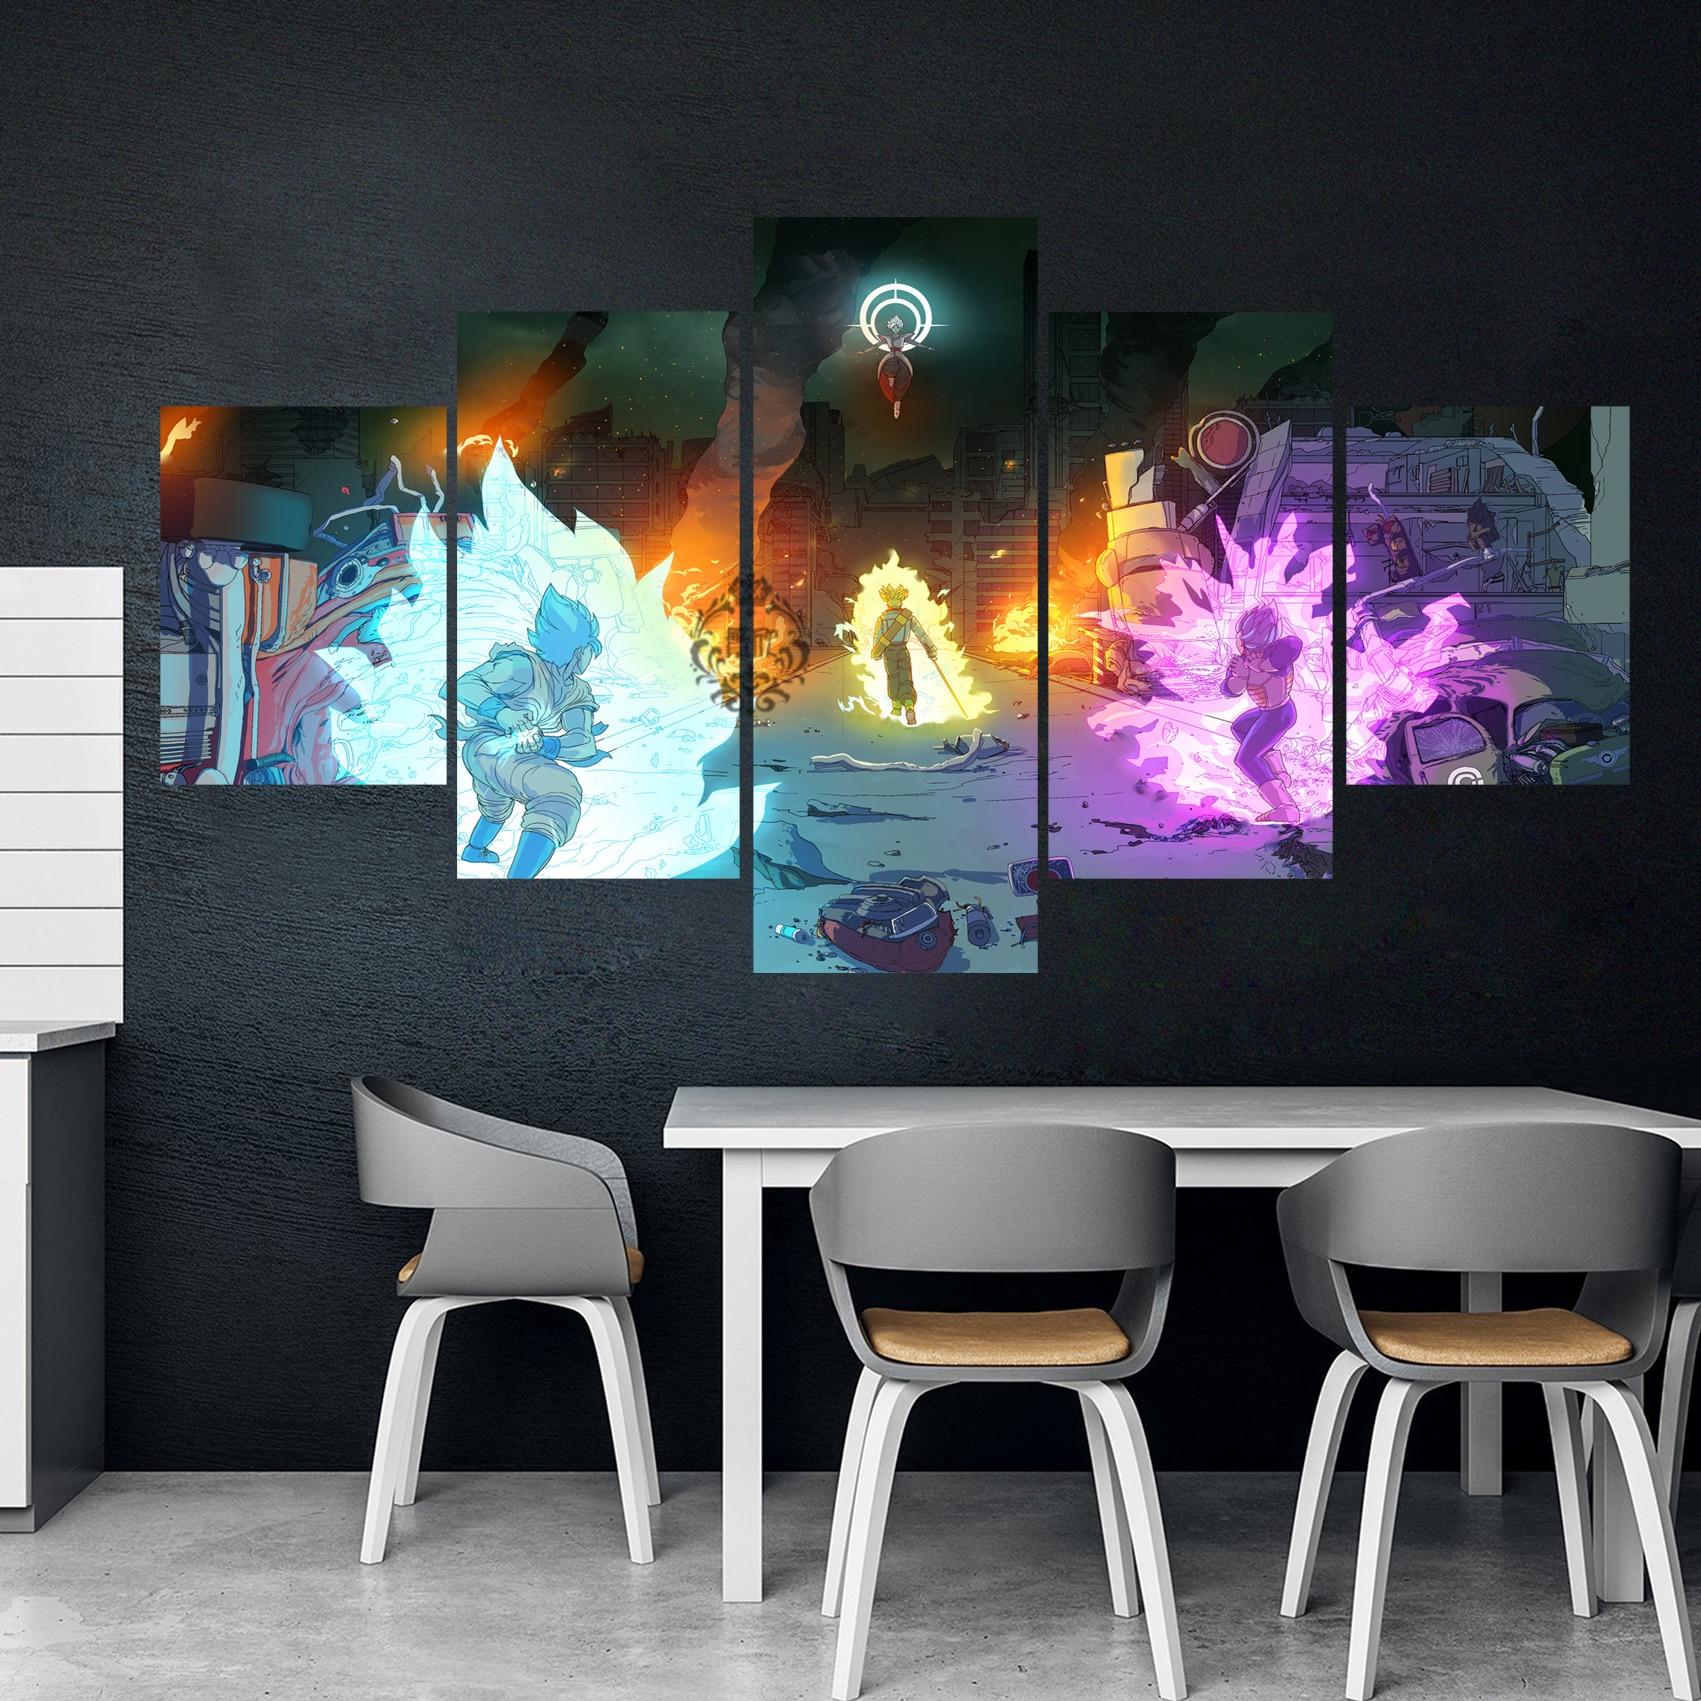 Cuadro Canva Modular para decoración del hogar, 5 piezas de dibujo de Dragon Ball Anime, póster de pared para el hogar, lienzo al por mayor